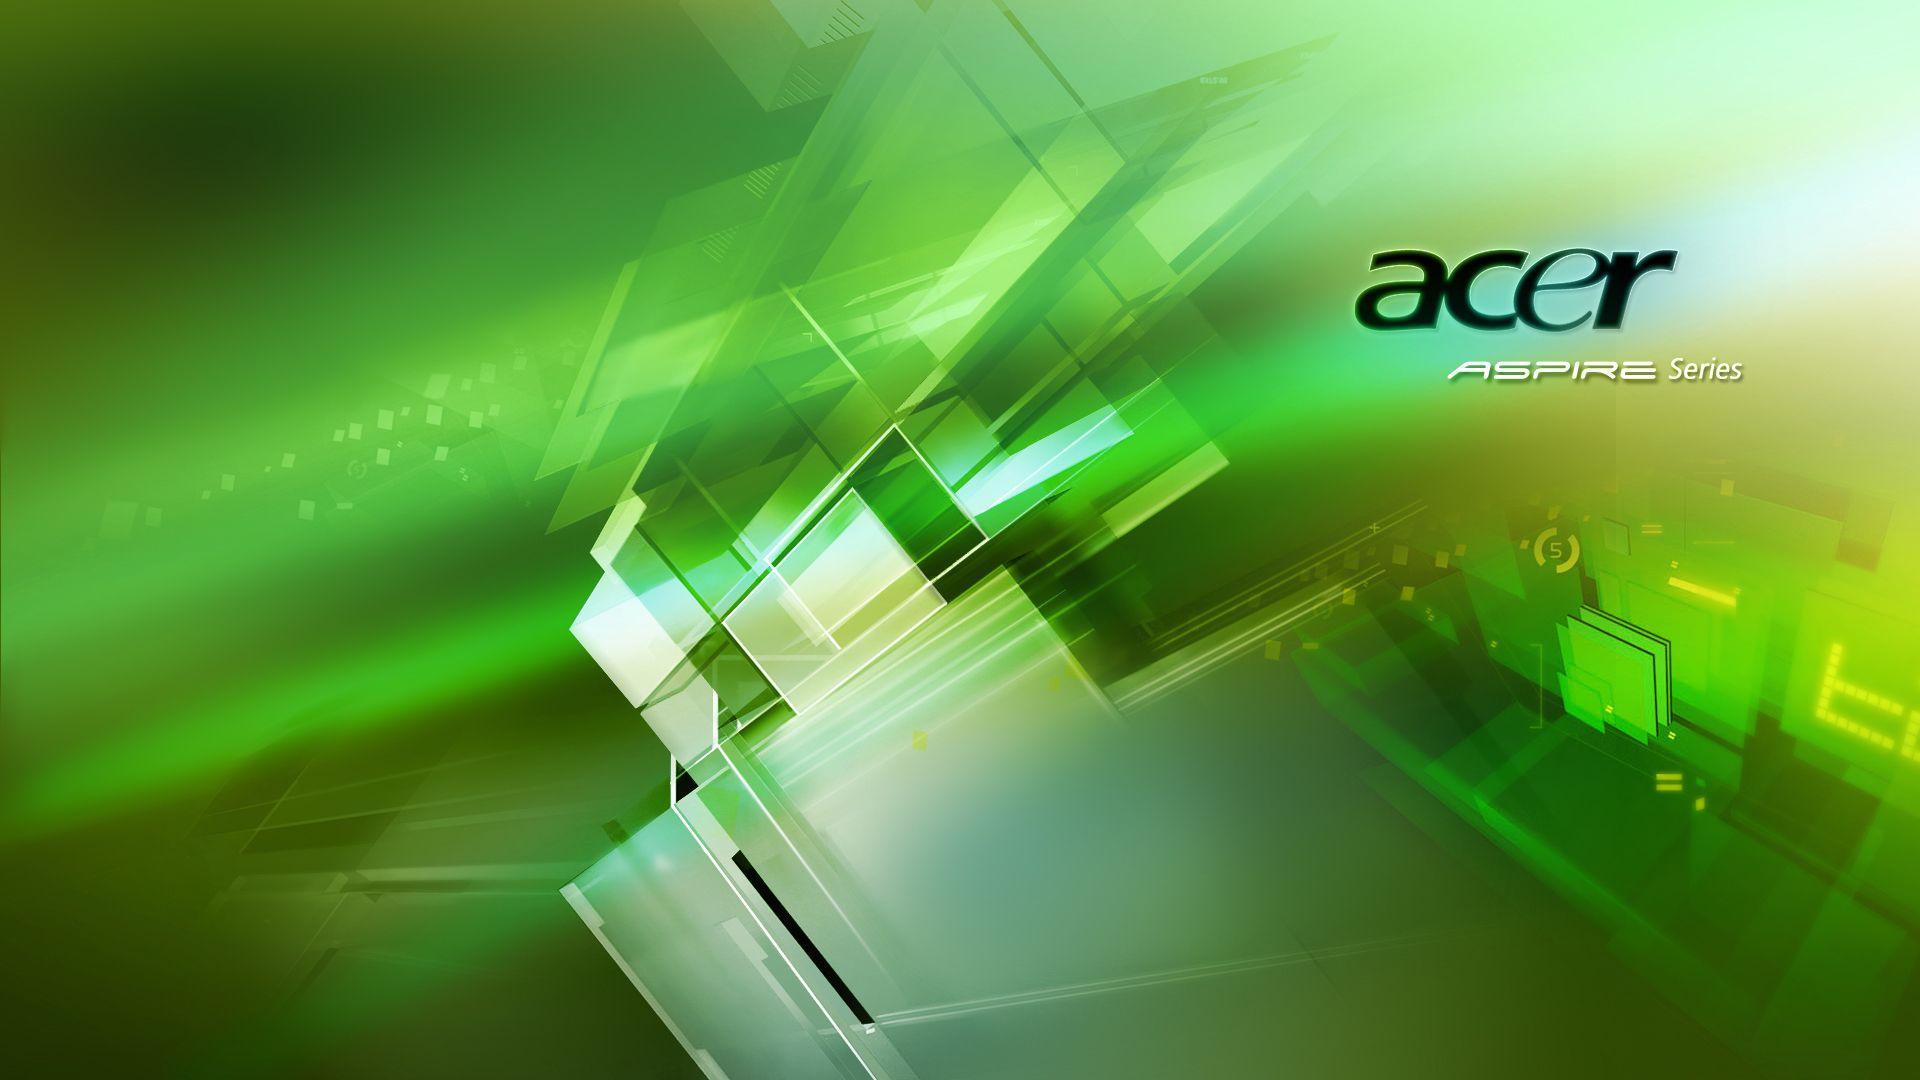 Wallpaper Acer Aspire 7